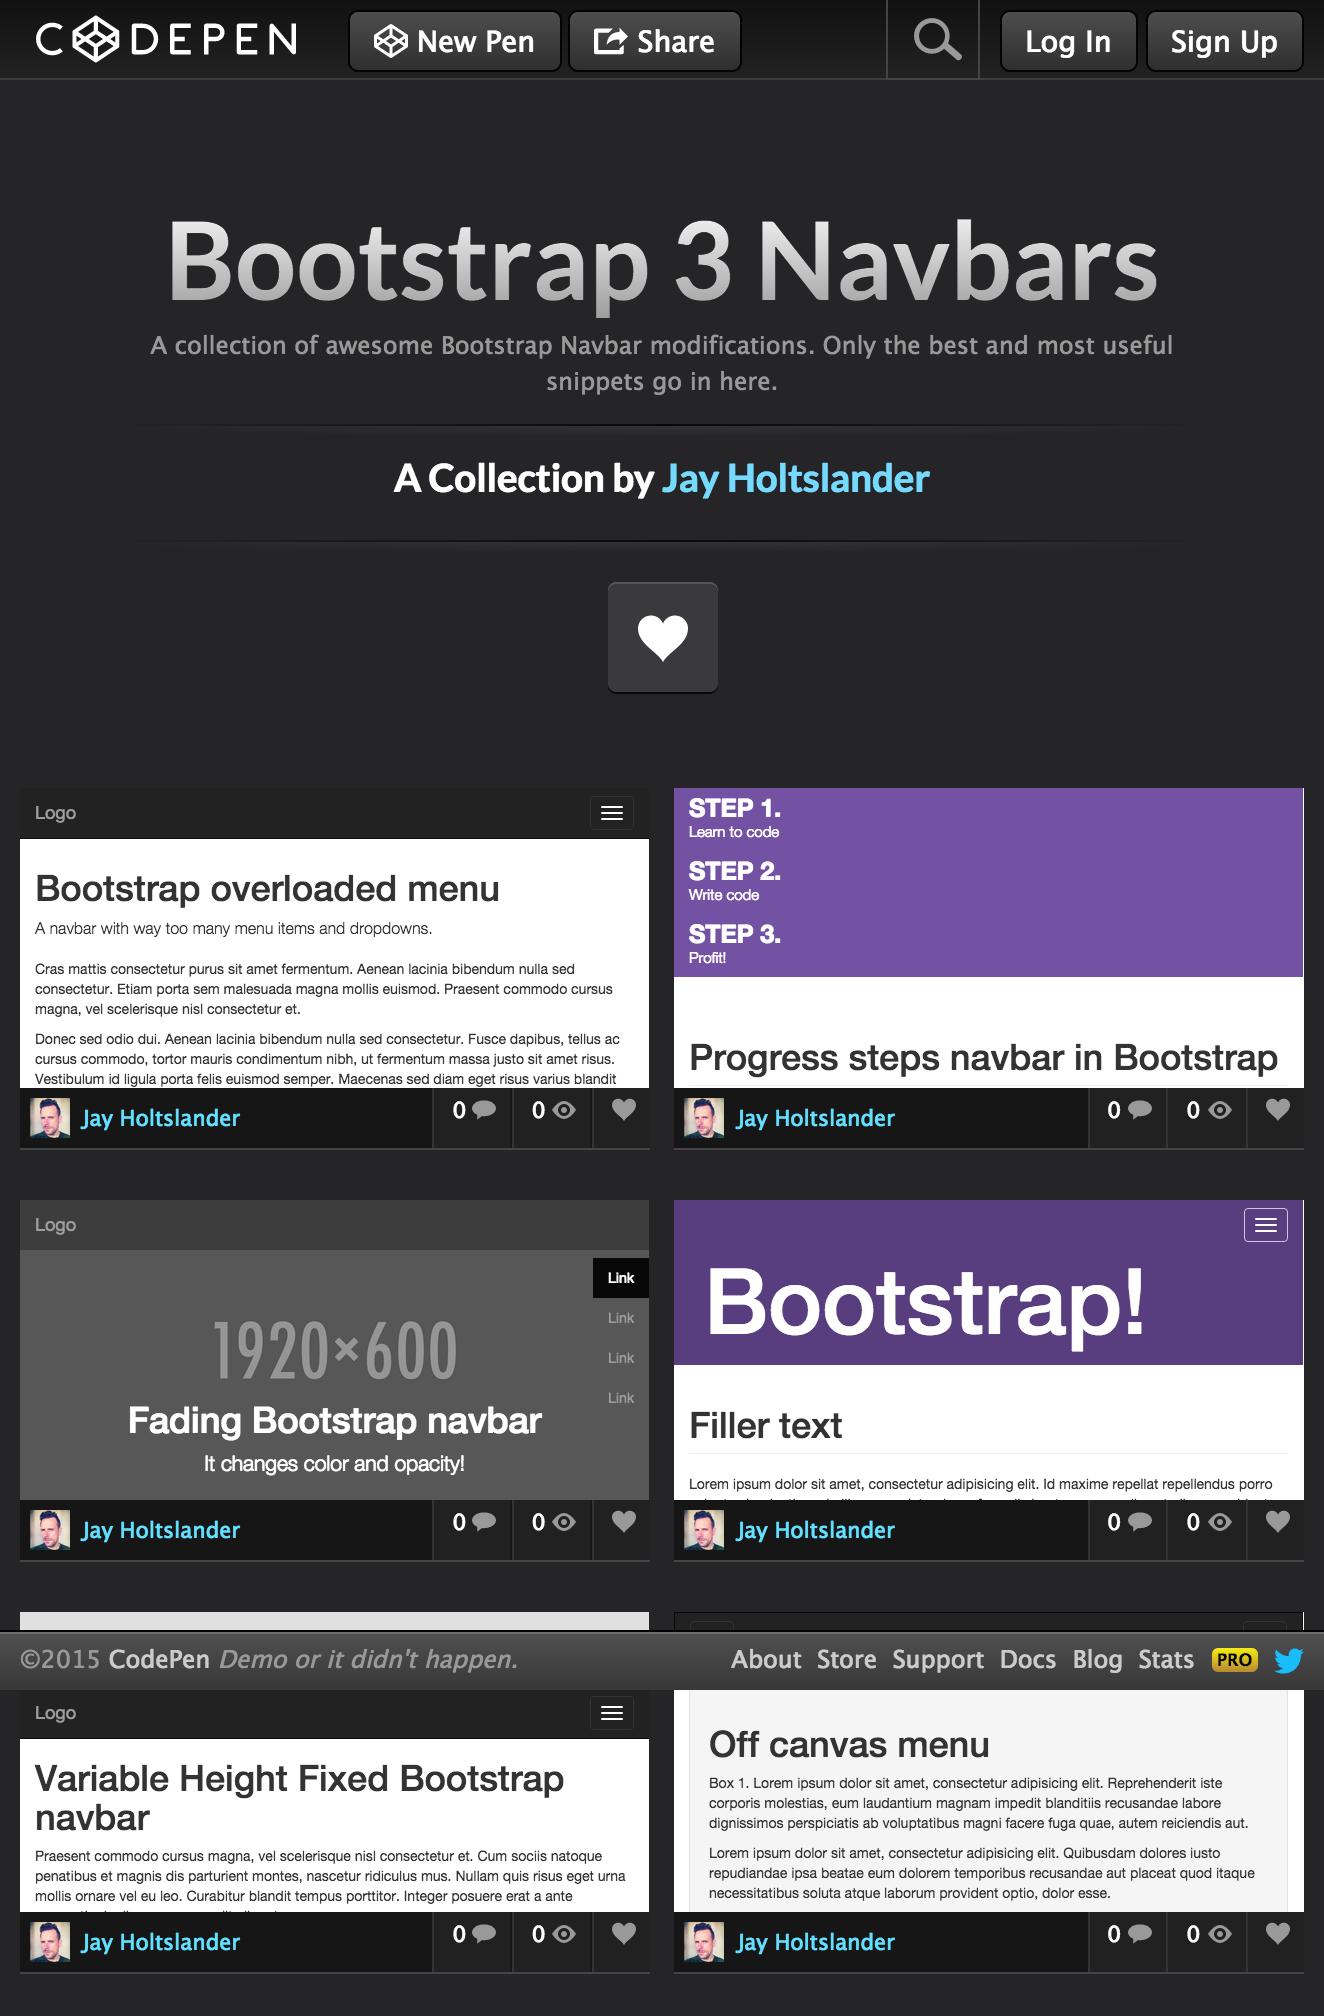 Bootstrap 3 Navbars - a Collection by Jay Holtslander on | Design